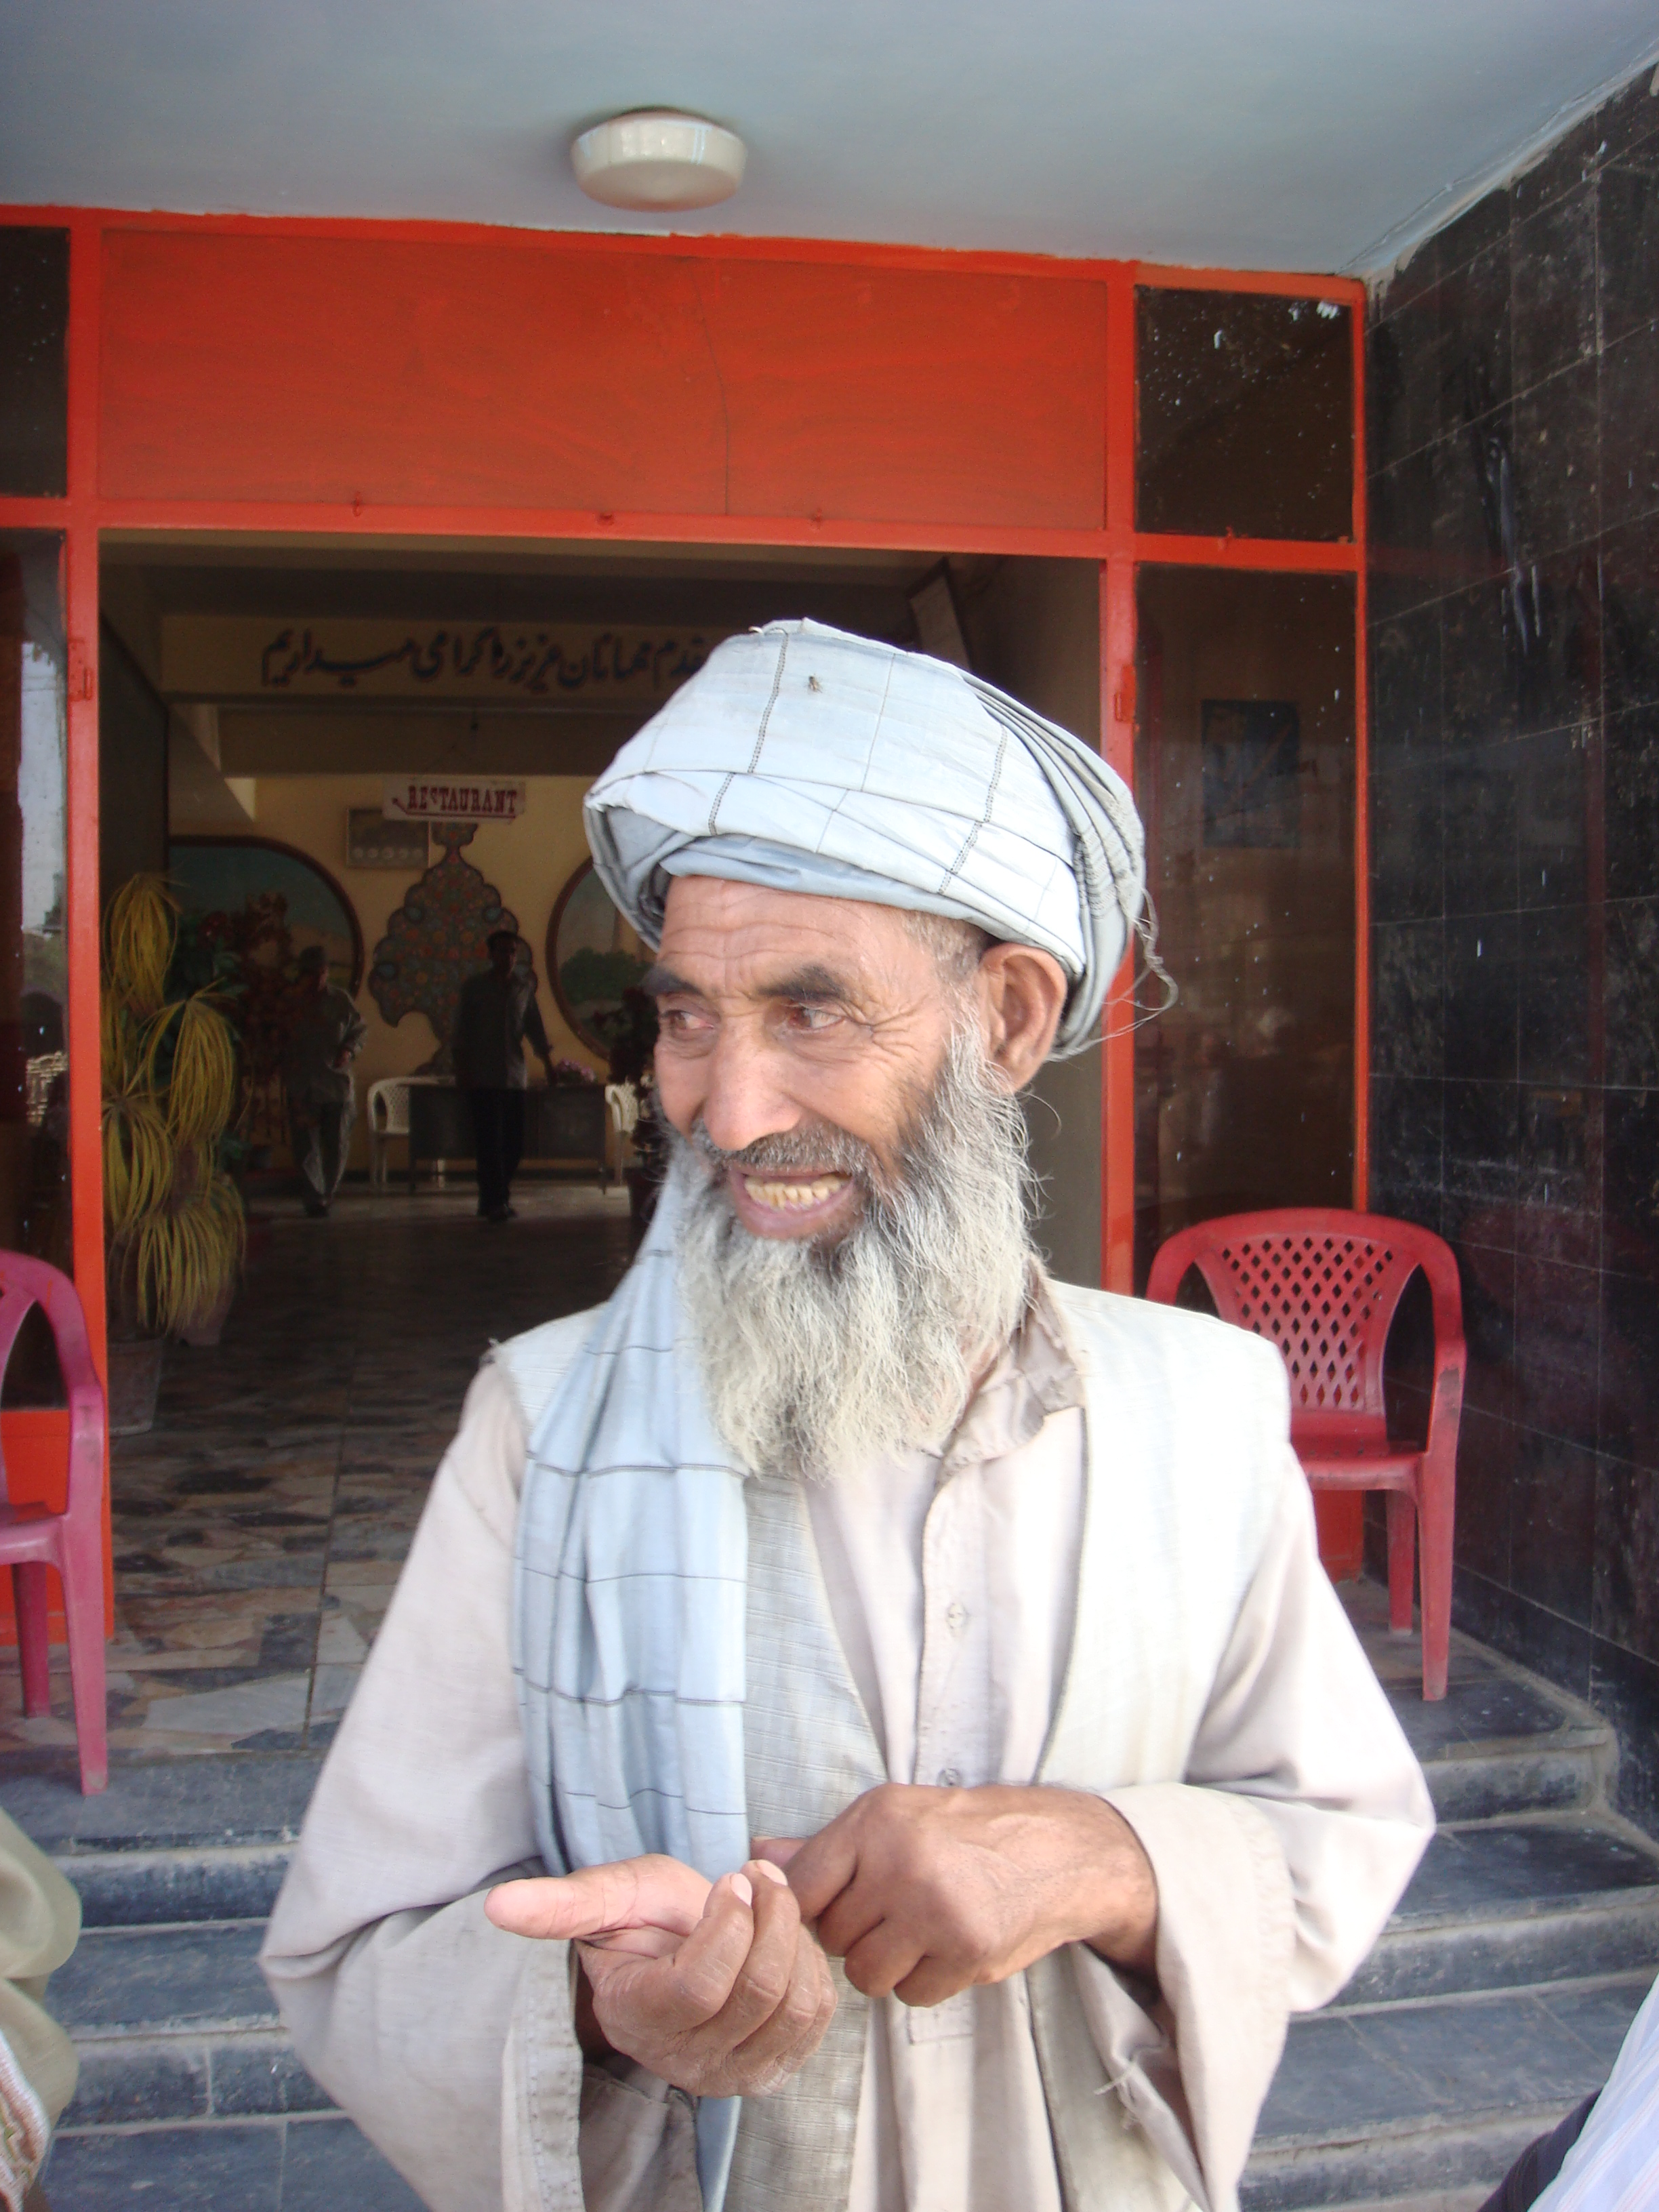 Visiting herat afghanistan part 1 of 2 the velvet rocket